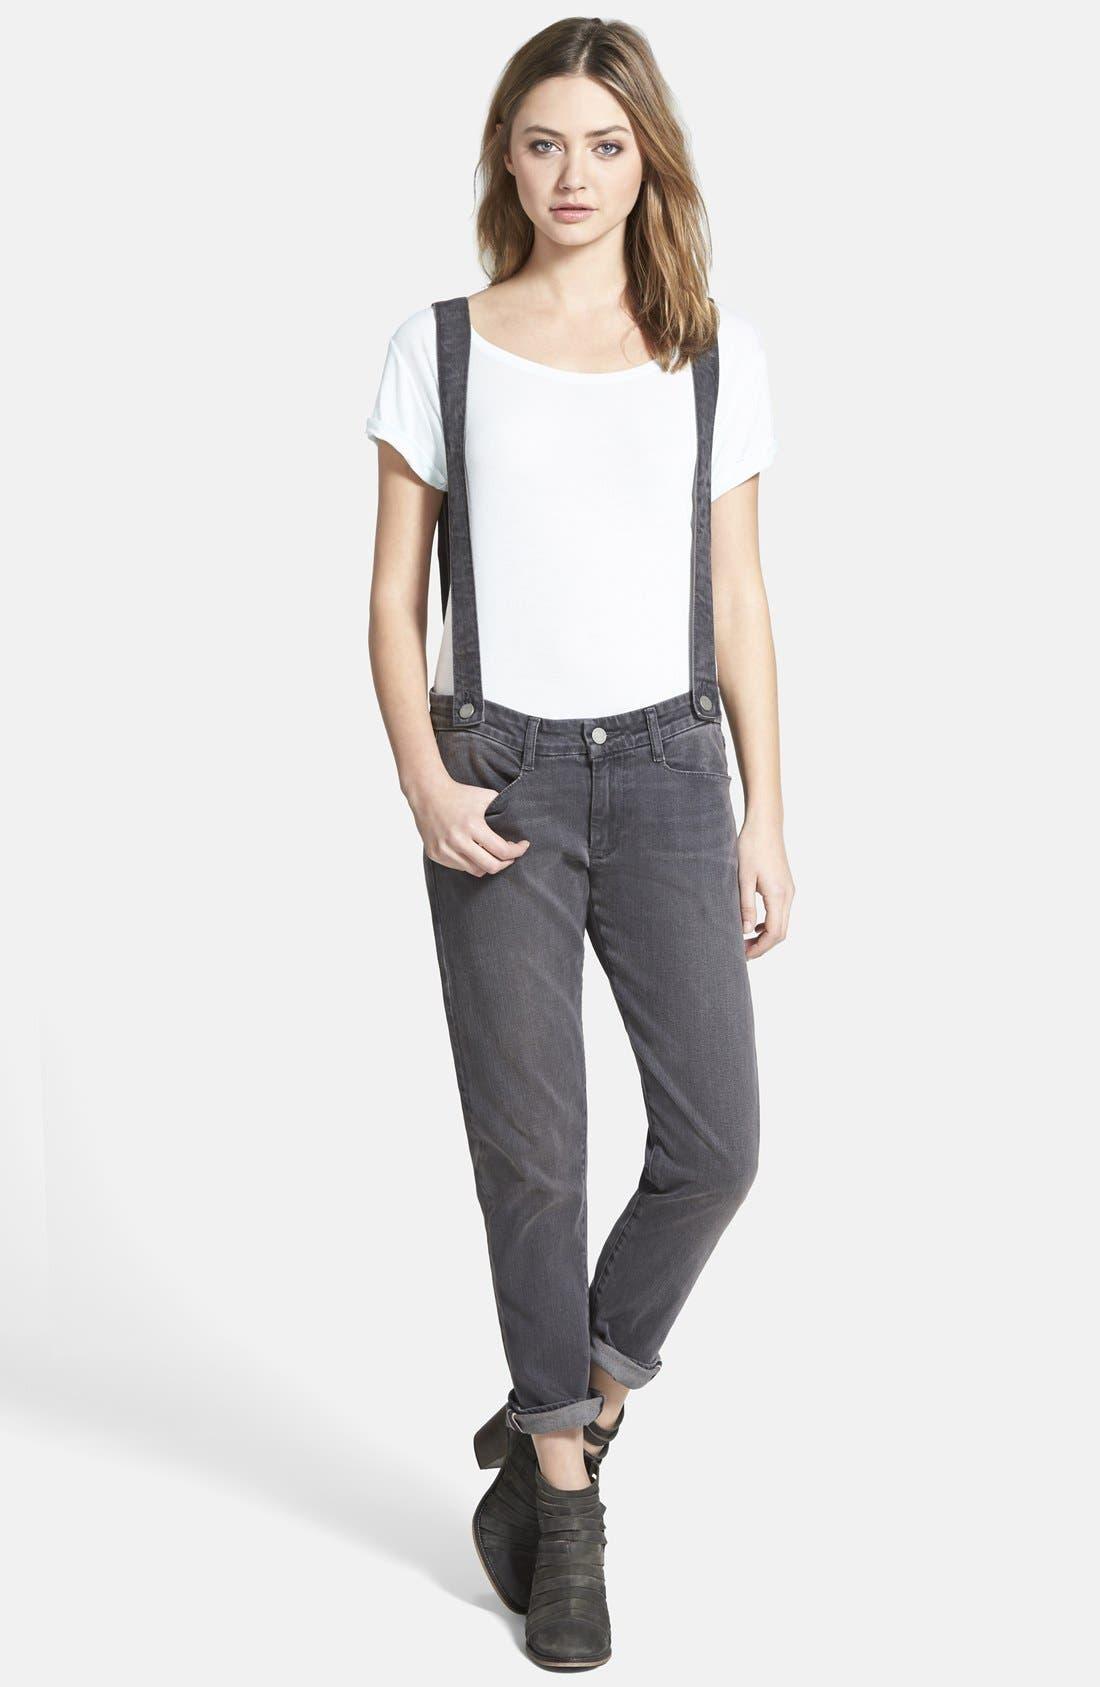 Main Image - Paige Denim 'Phillipa' Boyfriend Jeans with Suspenders (Rudy)